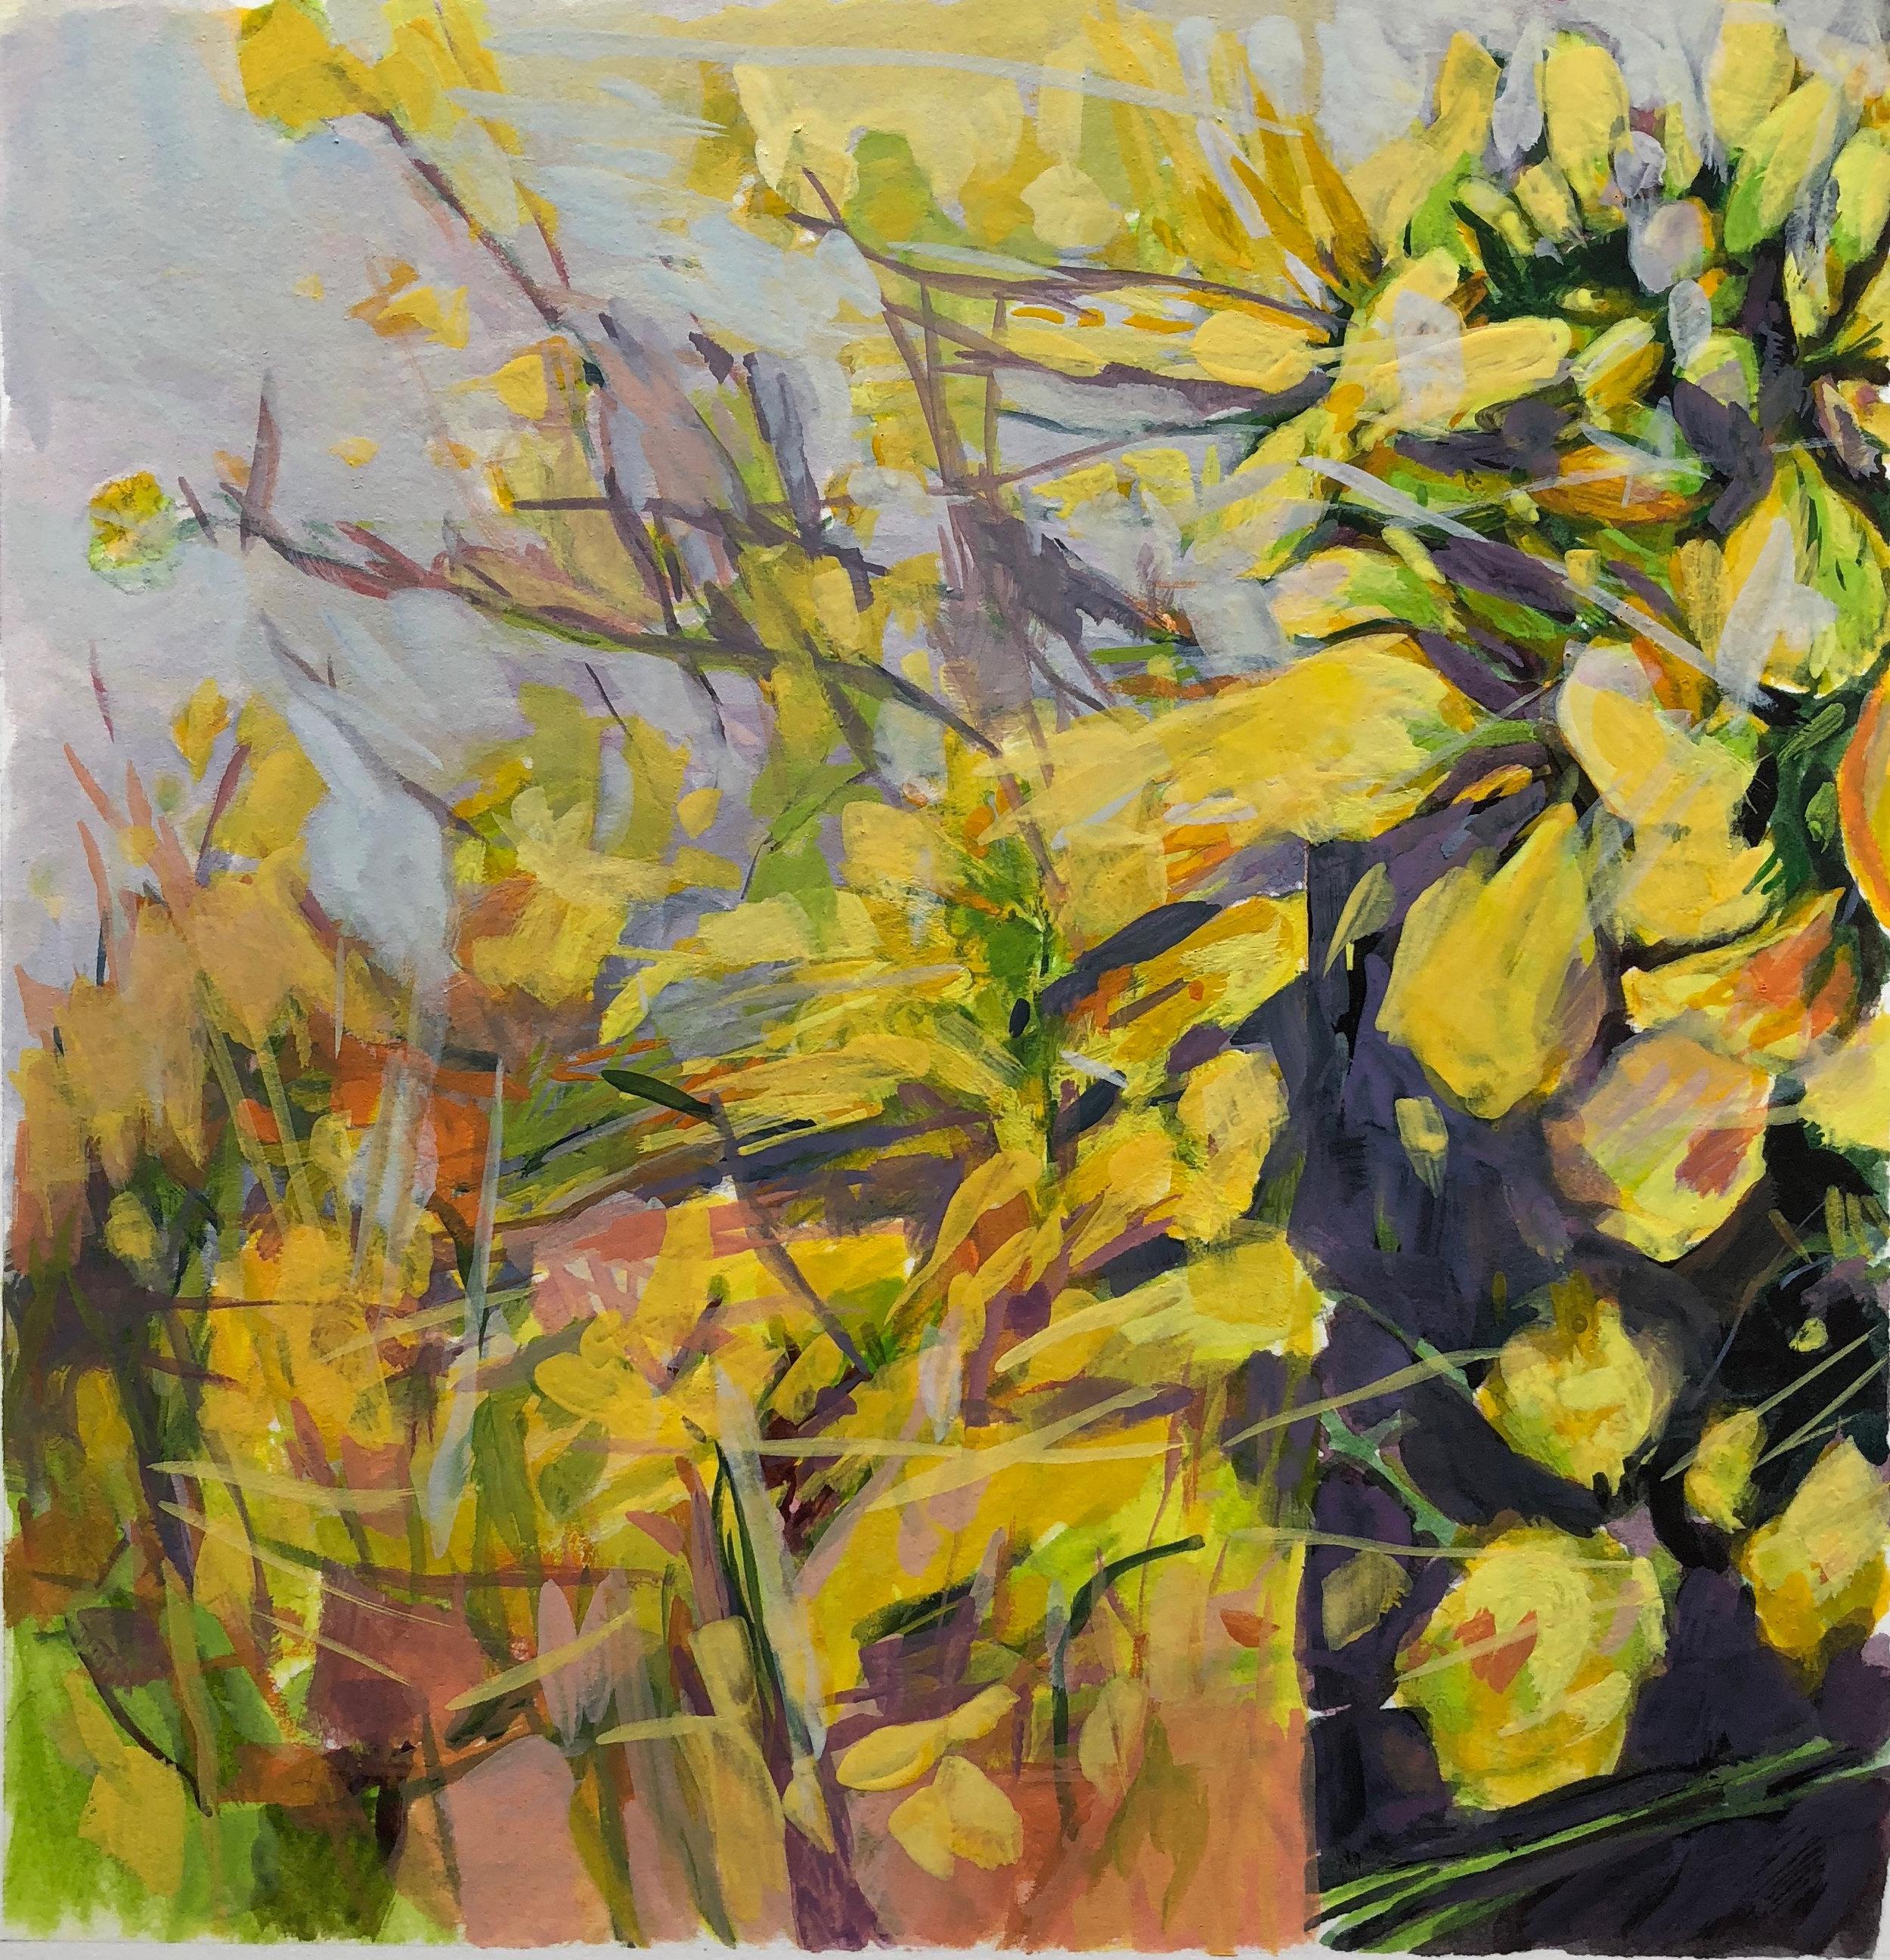 Wild Mustard Tangle 2018 7.25''x7'' gouache on Arches